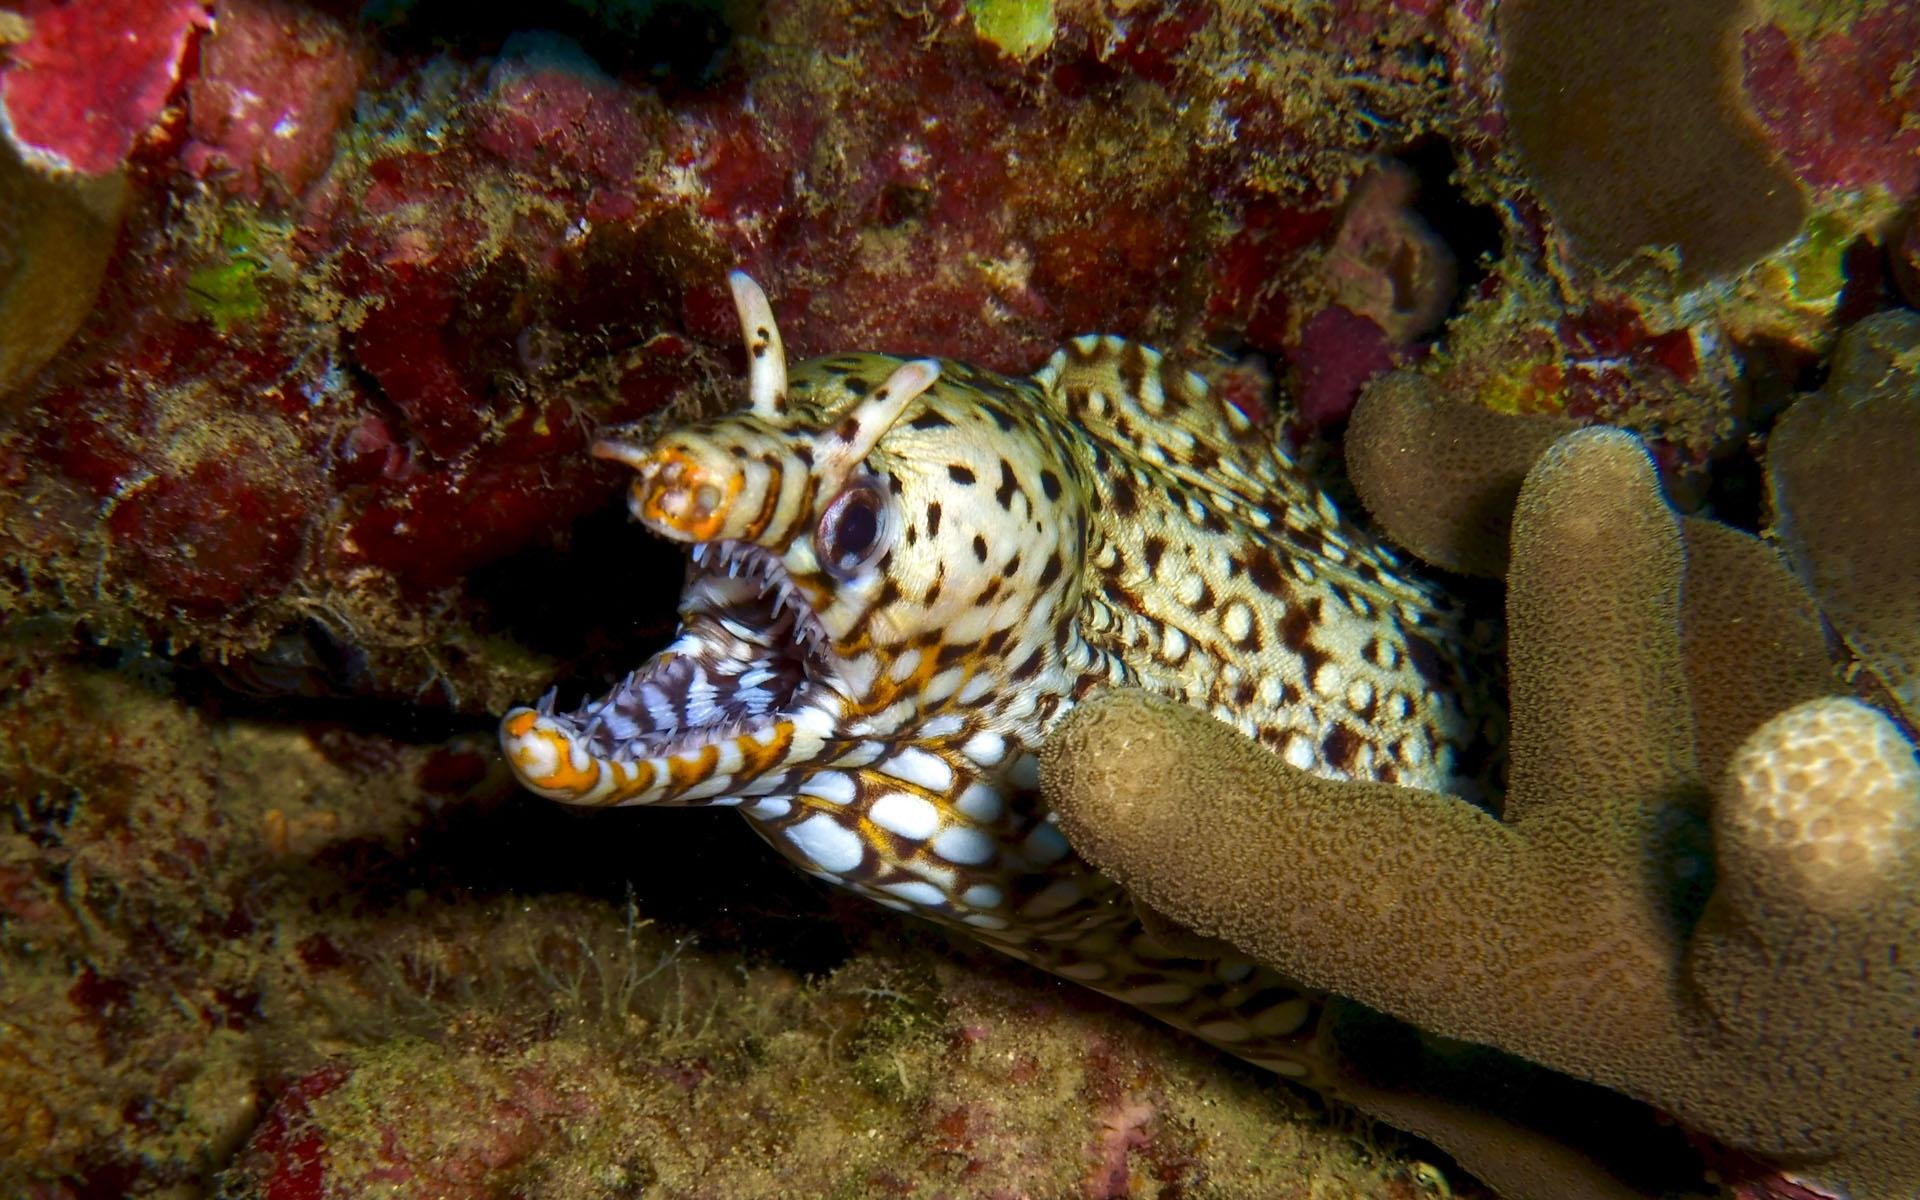 Oahu Scuba Shallow Reef Diving 8